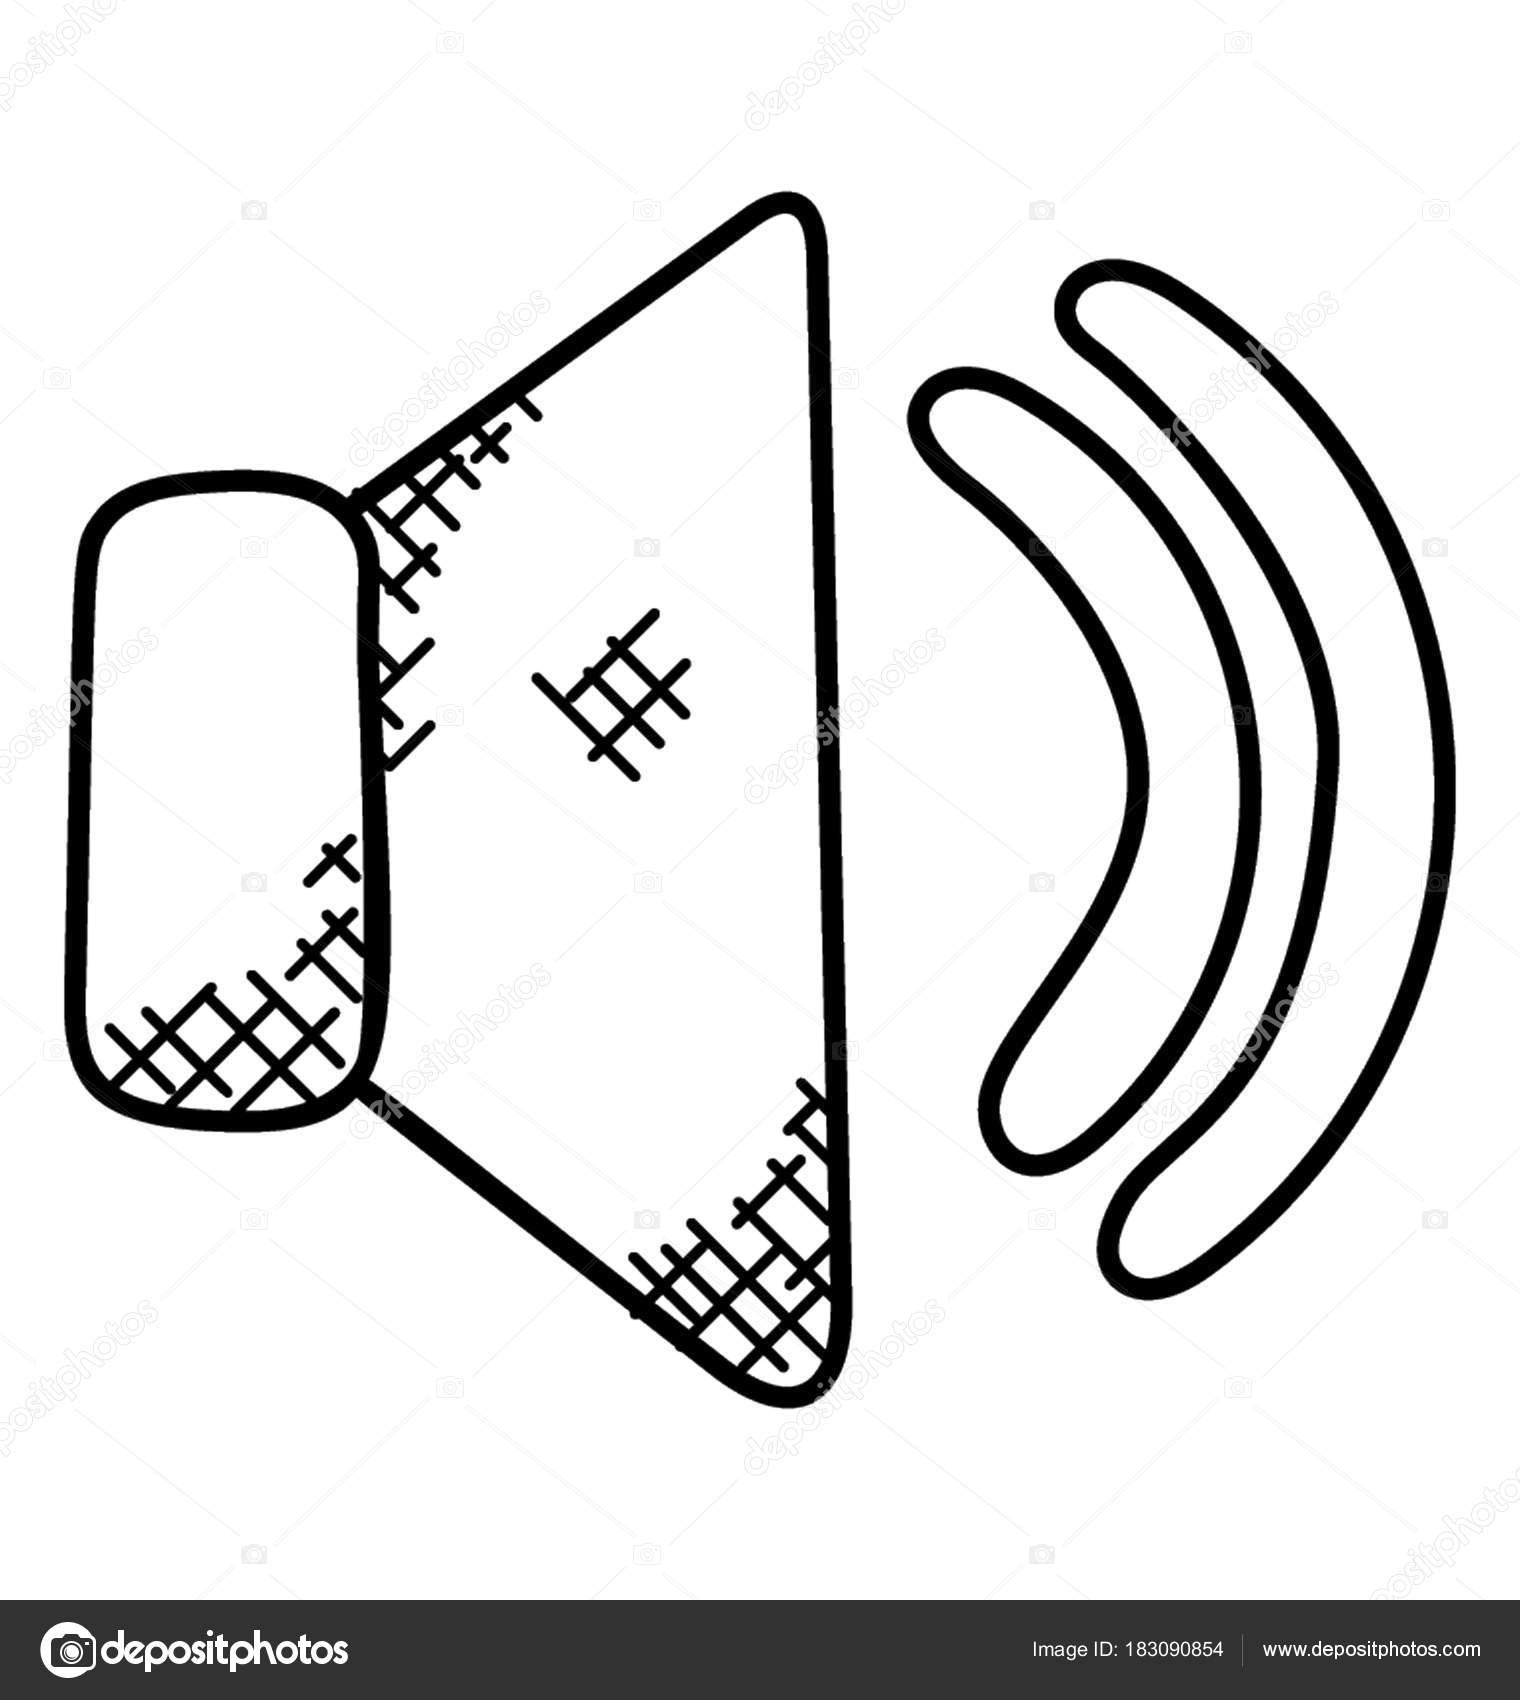 1520x1700 Simple Doodle Icon Loudspeaker Waves Representing Volume Icon